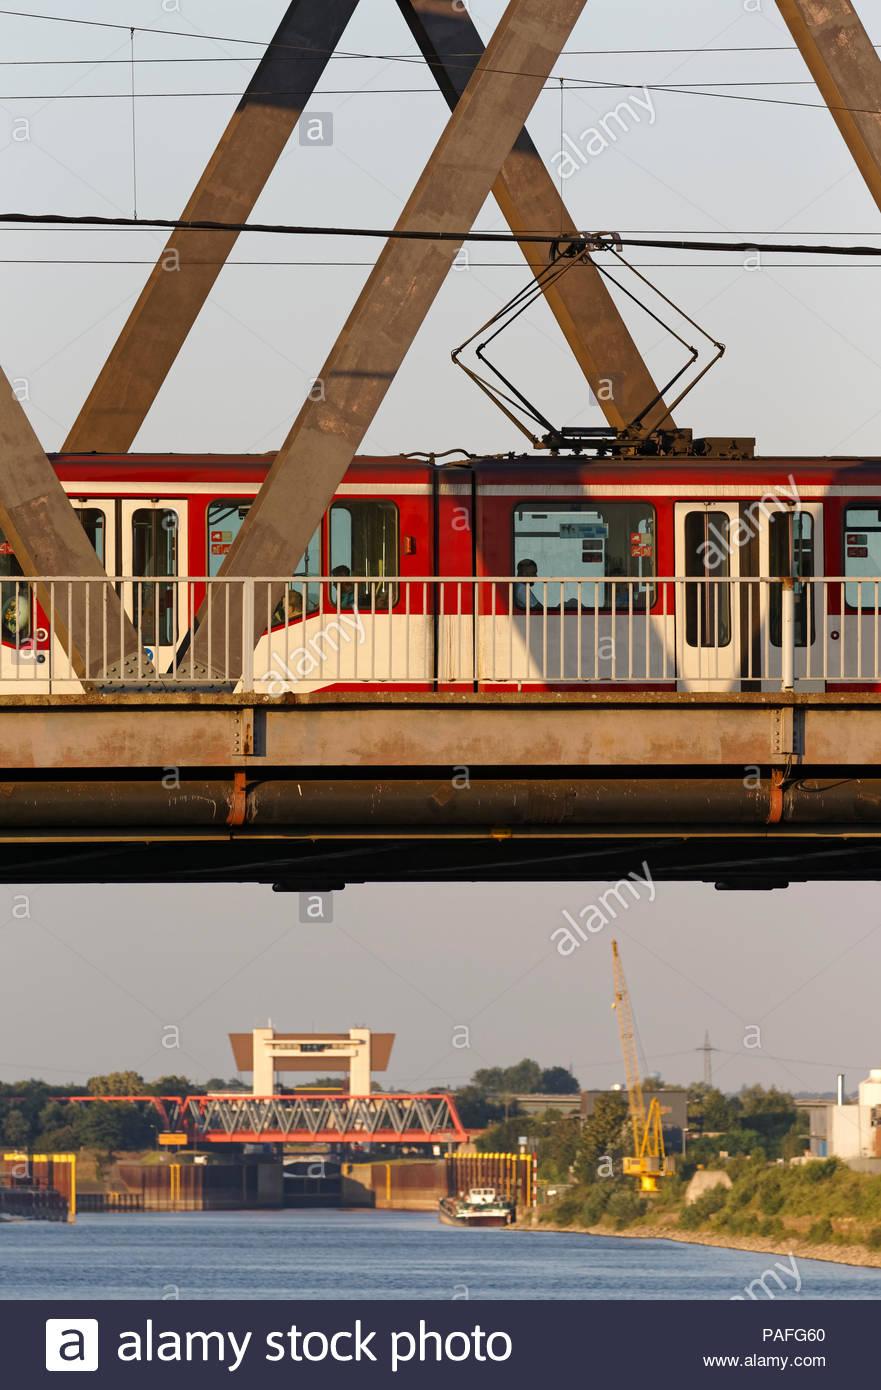 Duisburg Meiderich truss bridge with tram streetcar crossing Rhine-Herne-Canal waterway lock sluice gate tower water traffic transport inland port - Stock Image